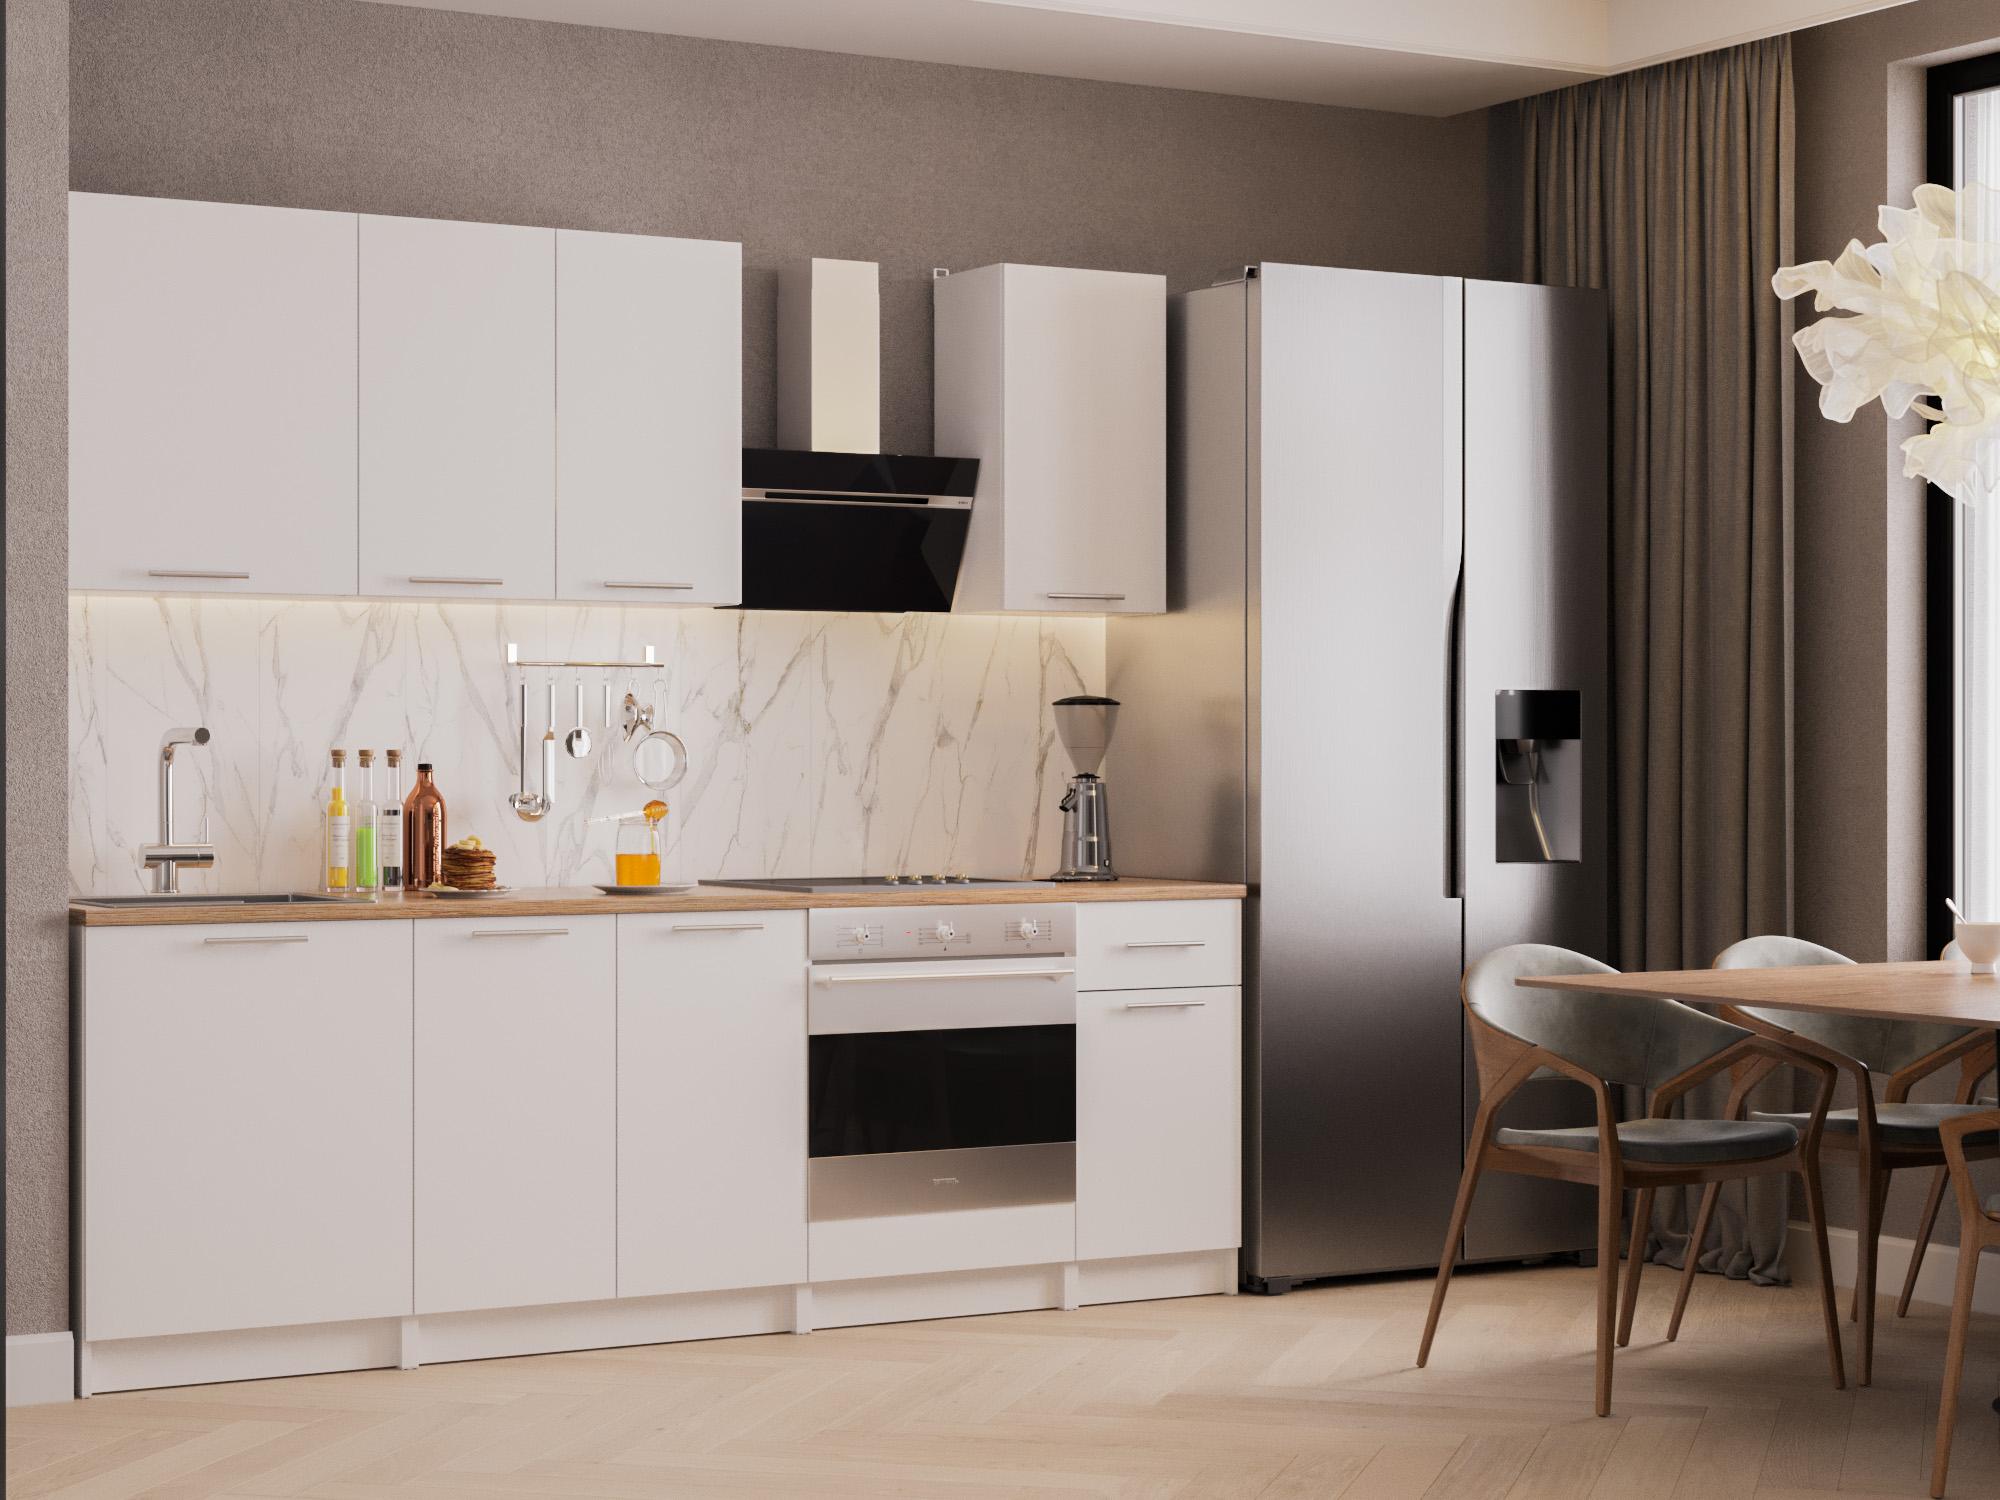 Кухня Моника 2,4 м Белый, , ЛДСП Белый